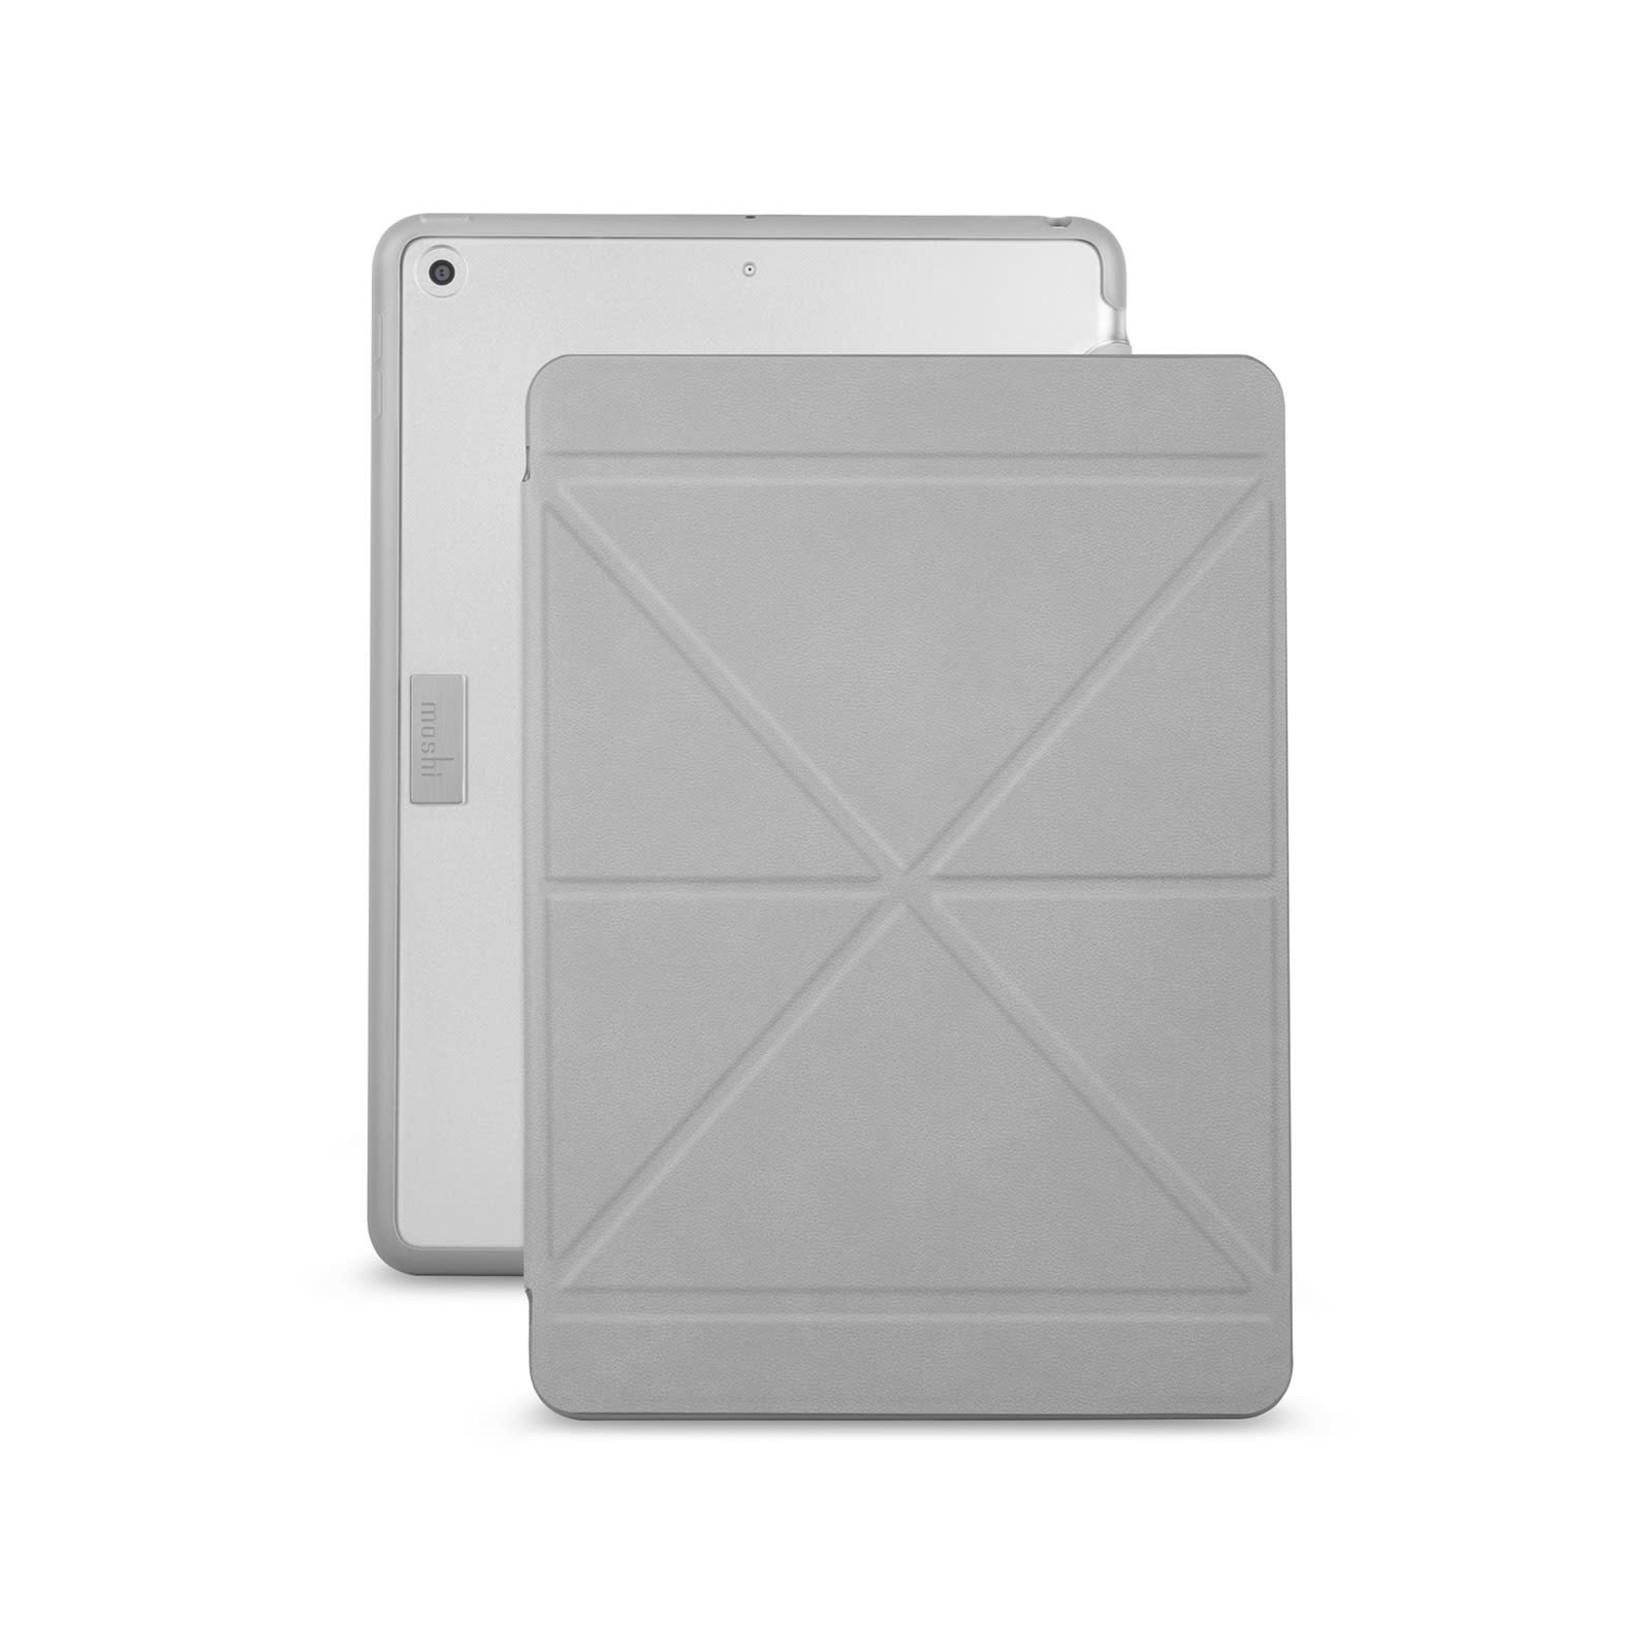 Moshi VersaCover for iPad (5th/6th Gen.) Gray